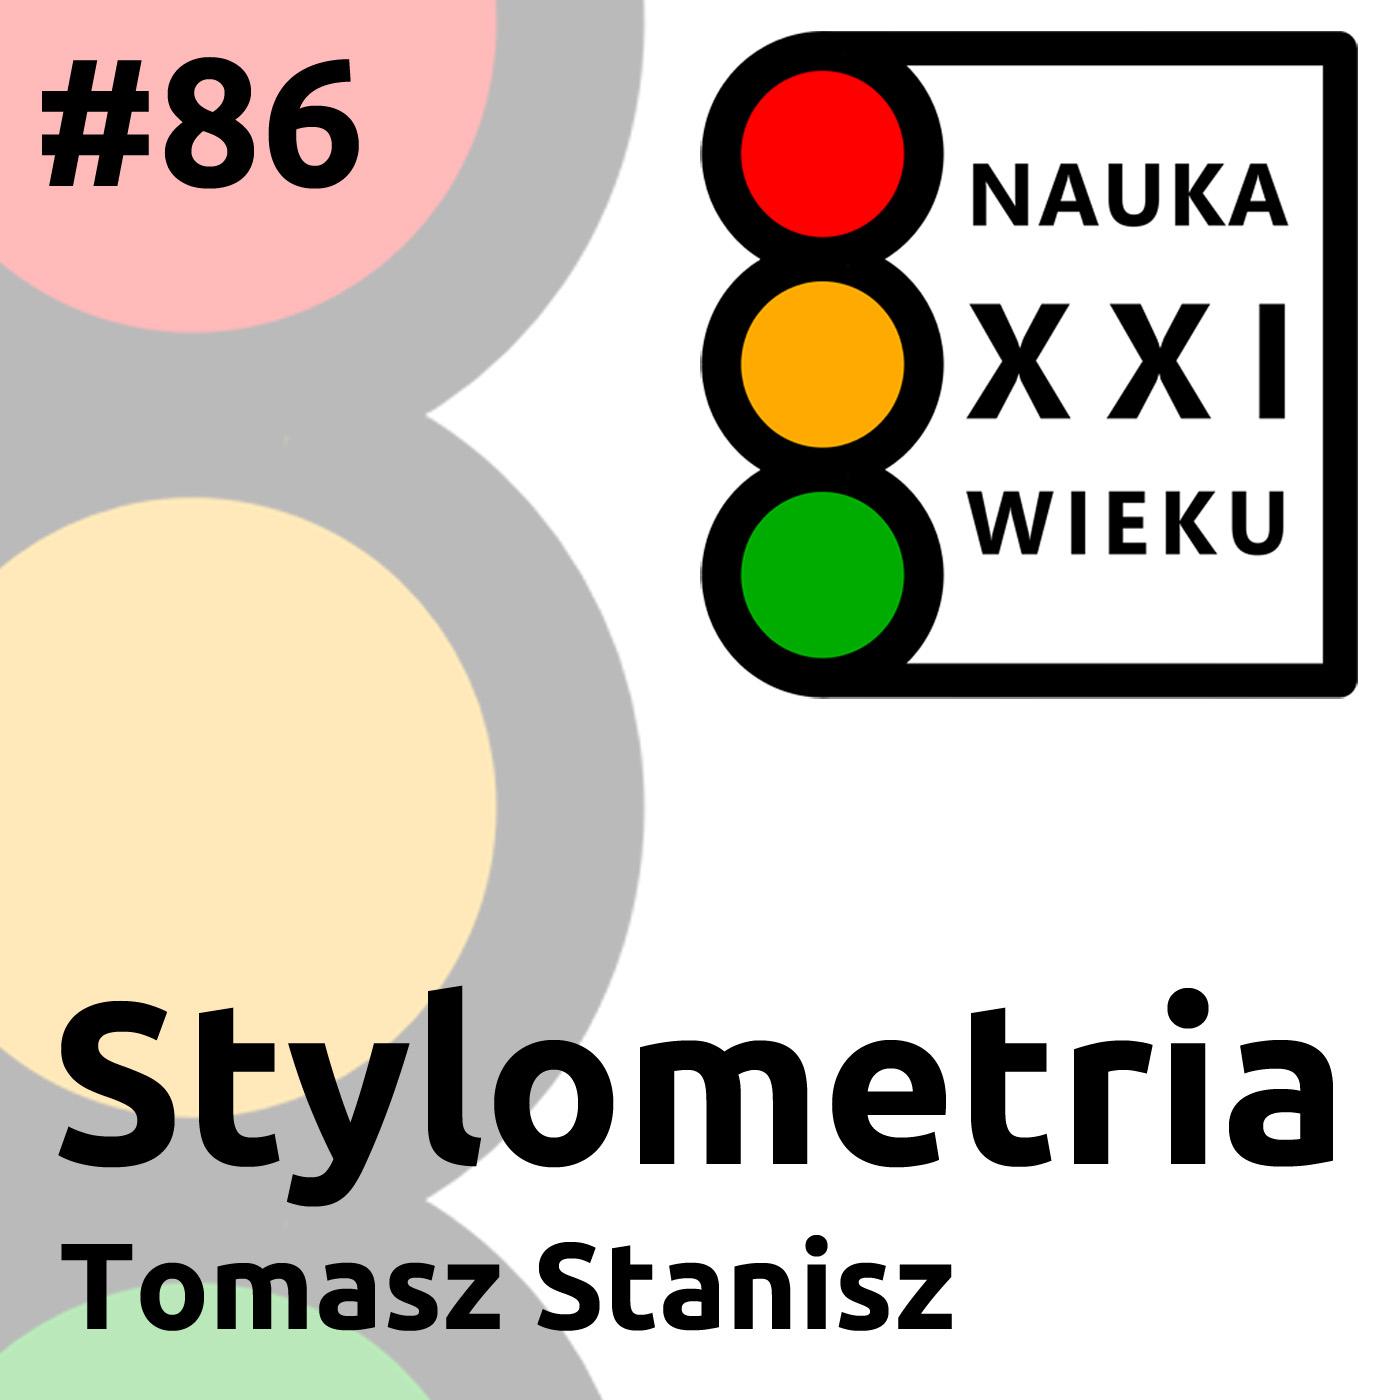 #86 - Stylometria